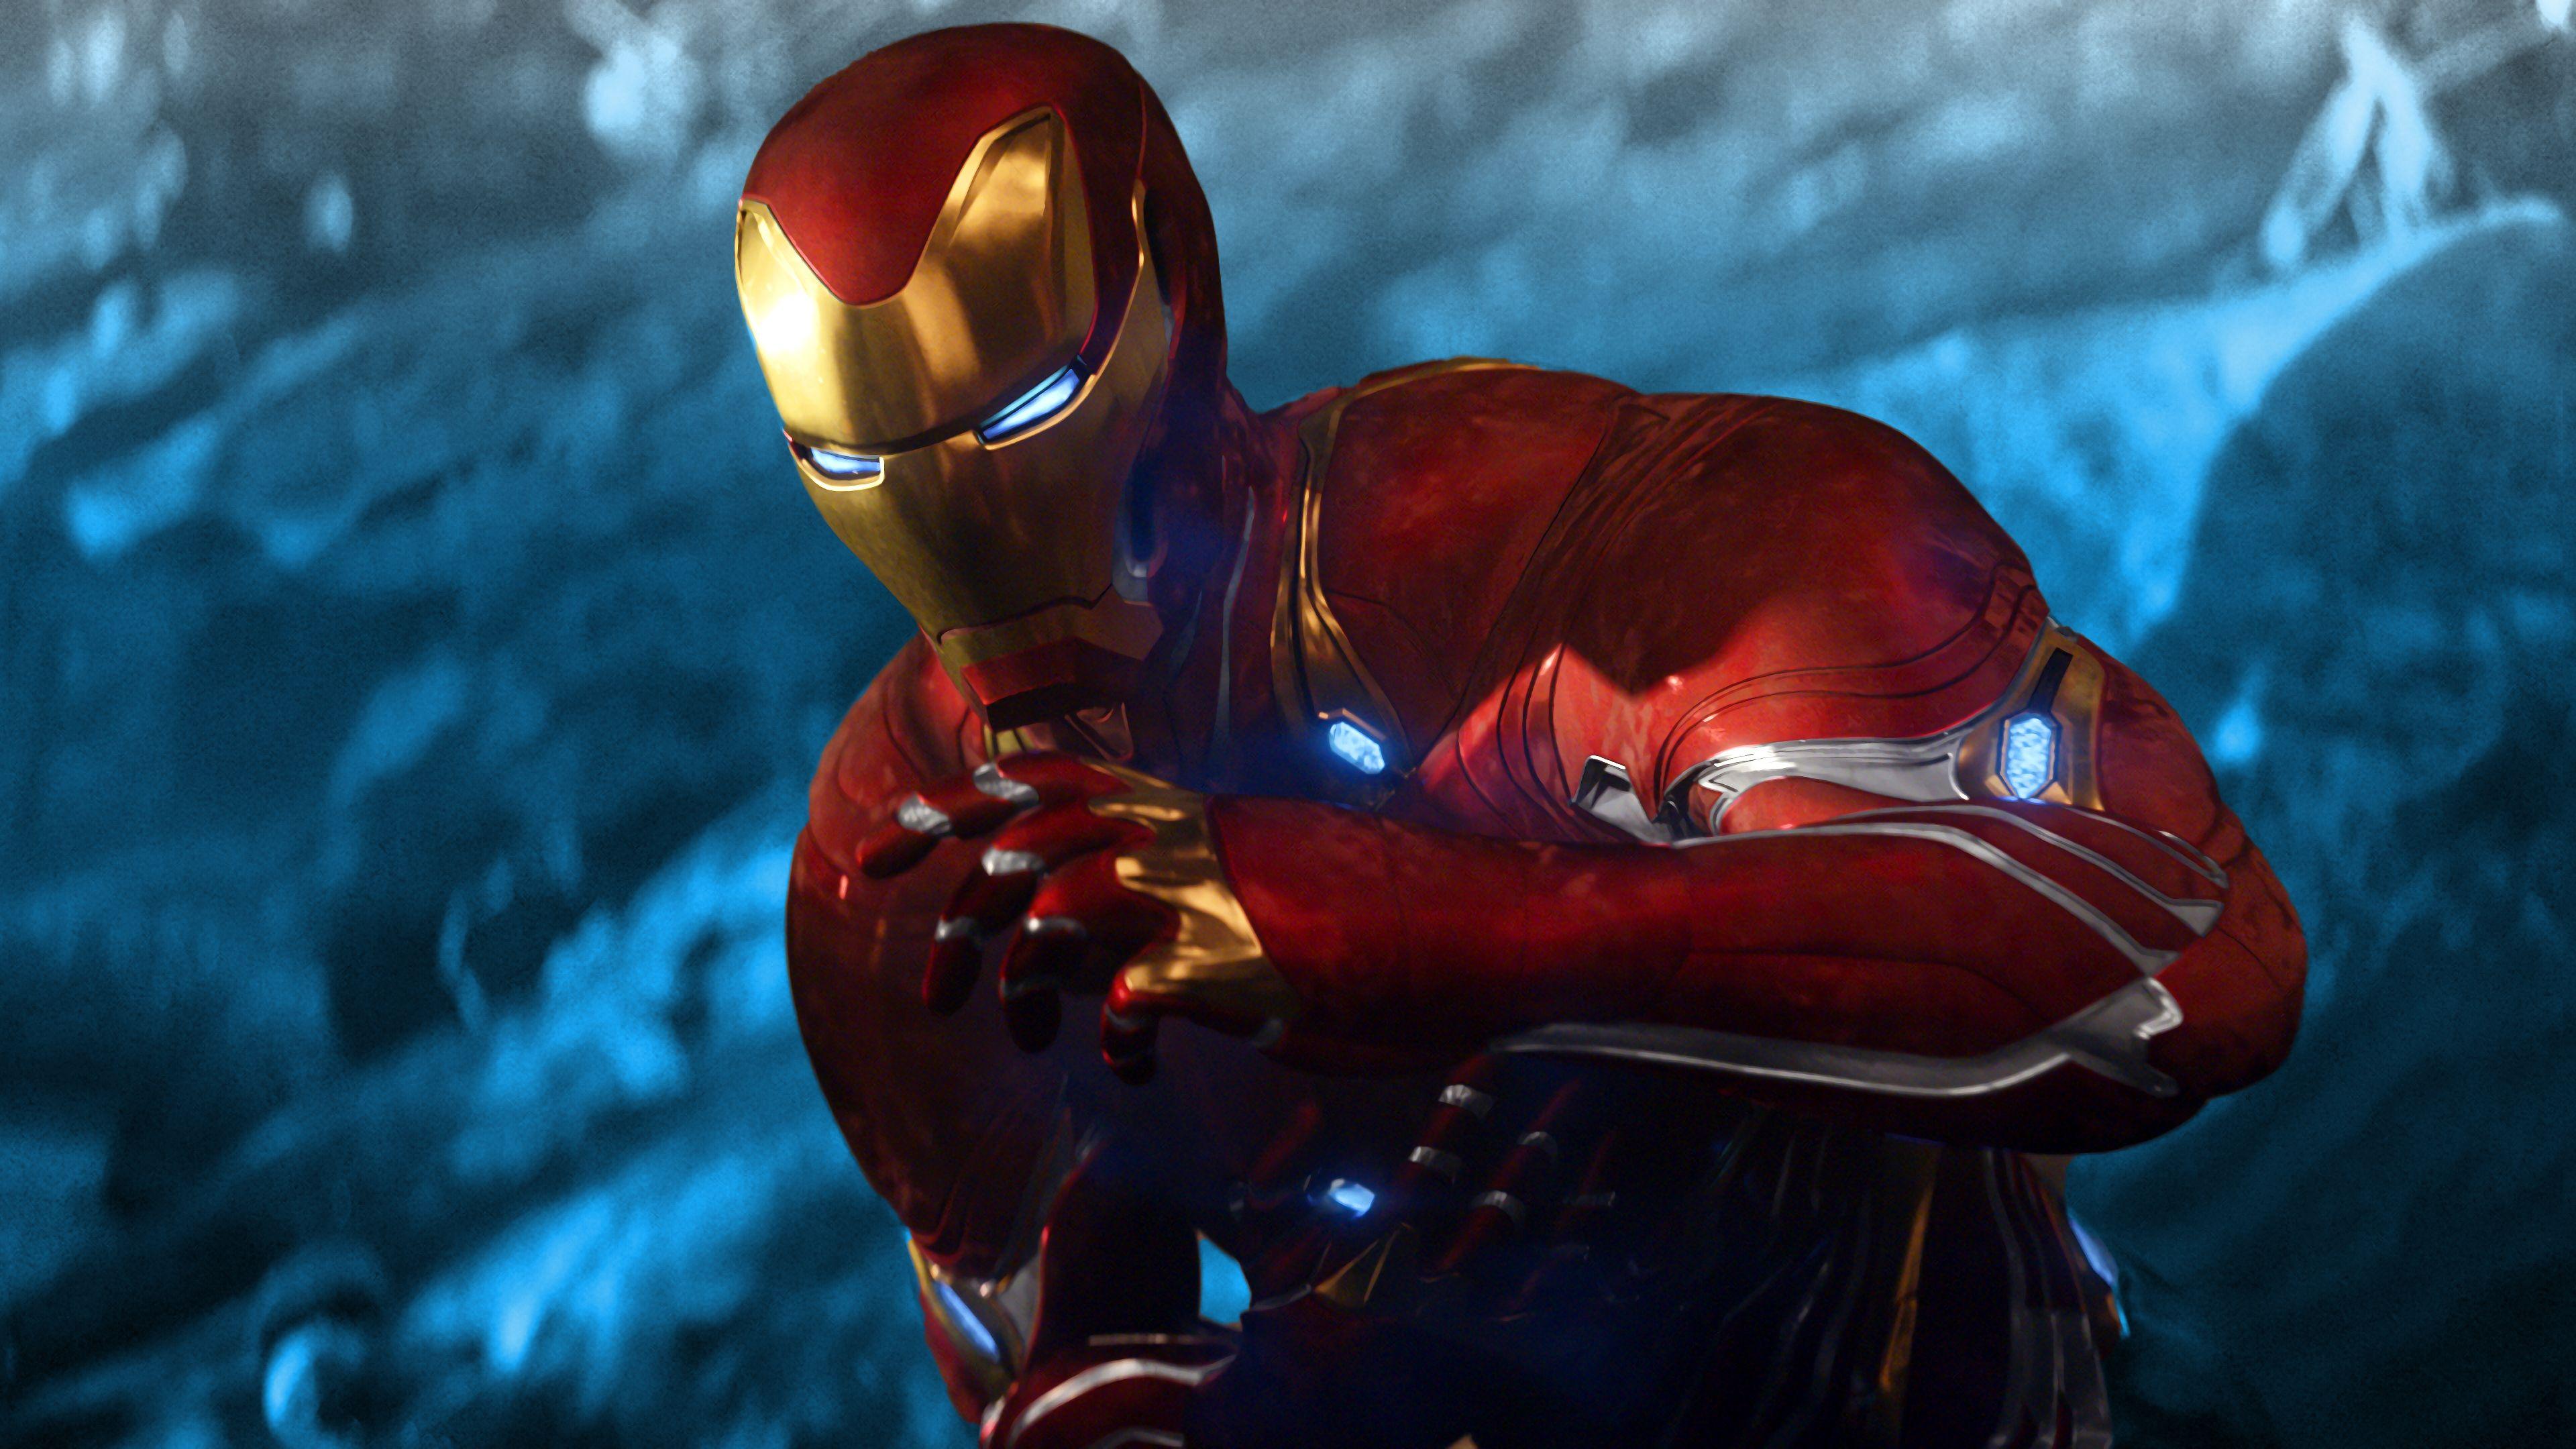 Iron Man Infinity War 4k Superheroes Wallpapers Iron Man Wallpapers Hd Wallpapers 4k Wallpapers Iron Man Wallpaper Iron Man Avengers Infinity War